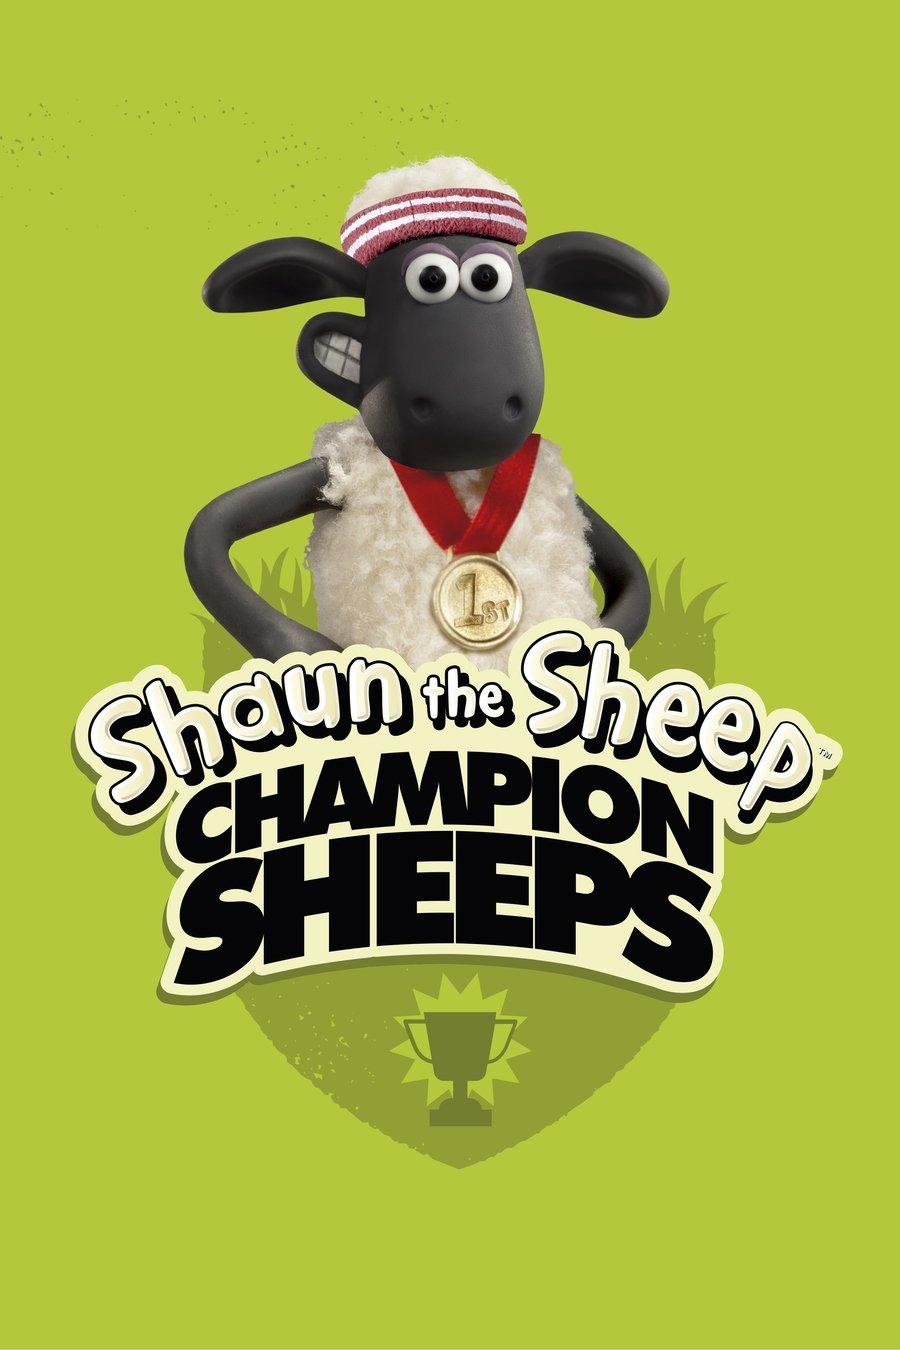 La Oveja Shaun: Championsheeps